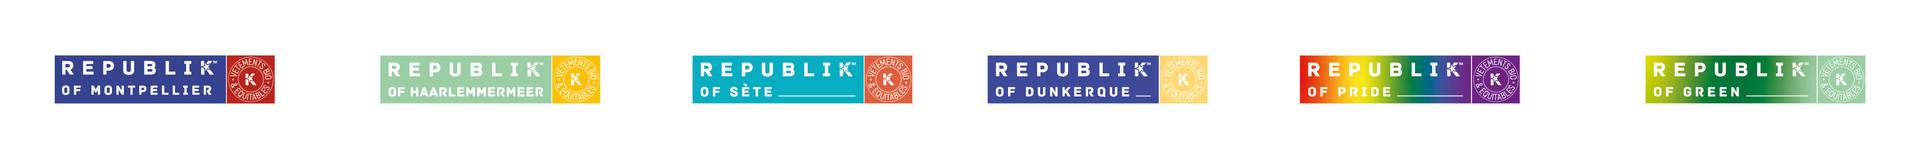 studiowam-republik-of-logo-design